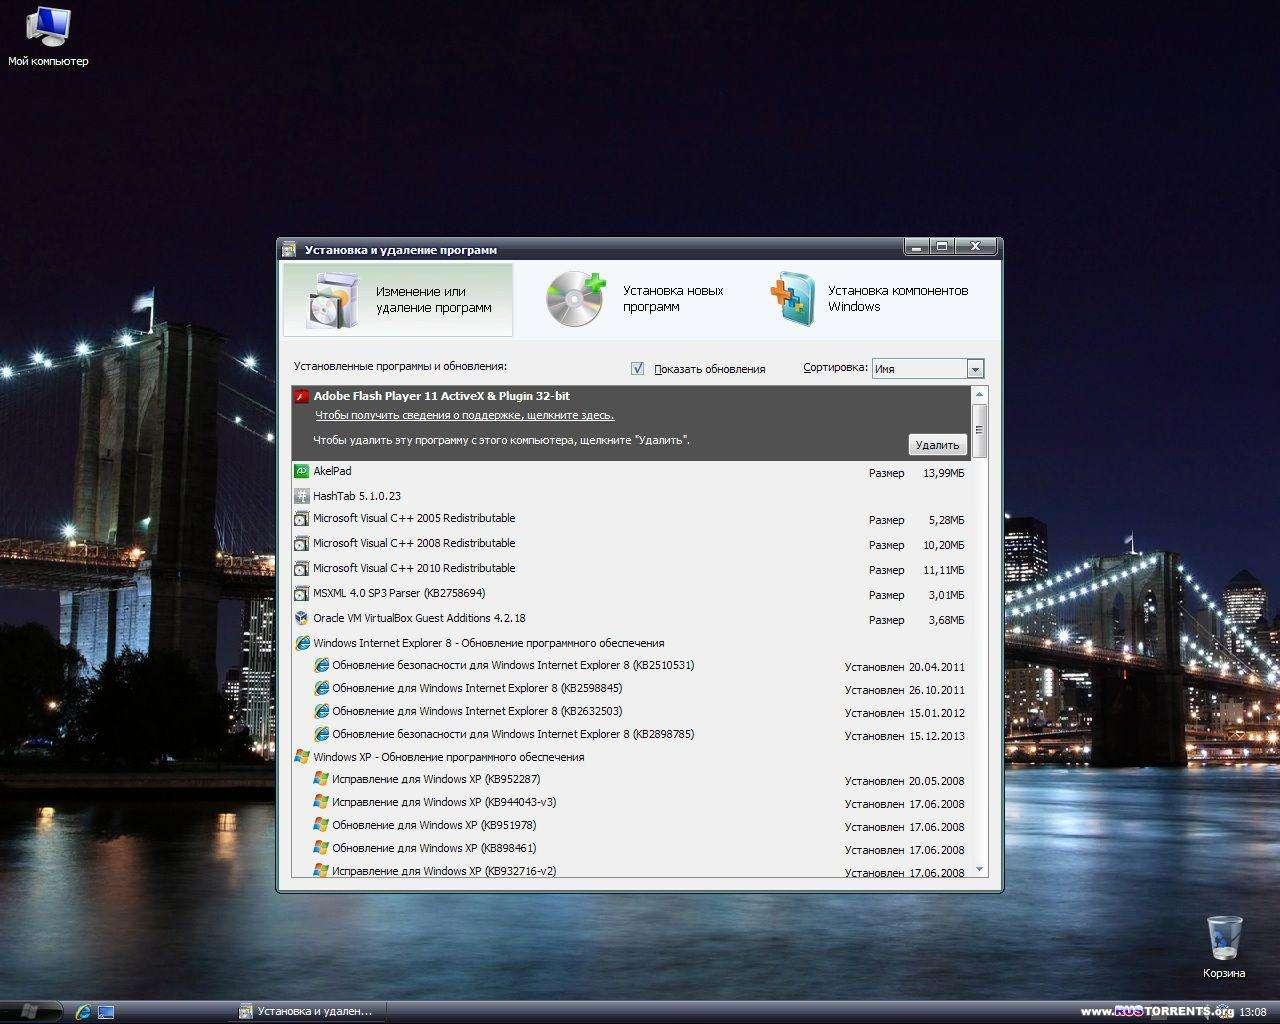 Windows ХР x86 - NewStyleXP-Lite 20.12.2013 RUS